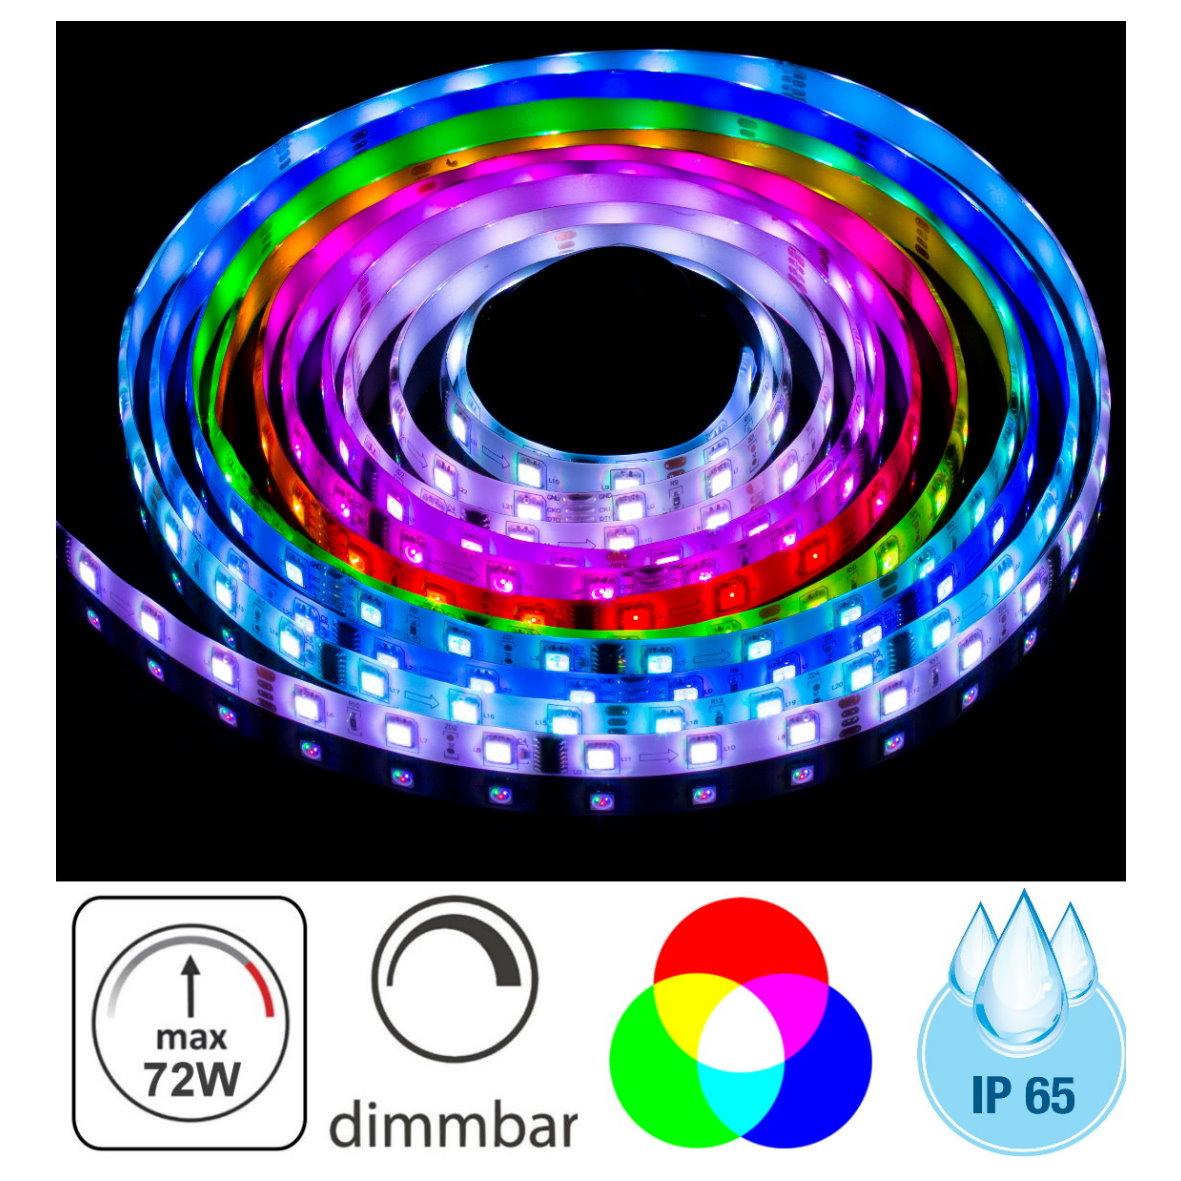 4 98 eur m led rgb lichtband 5m 72w ip65 dimmbar aussen strip 300x 5050 chip 4260499693411. Black Bedroom Furniture Sets. Home Design Ideas